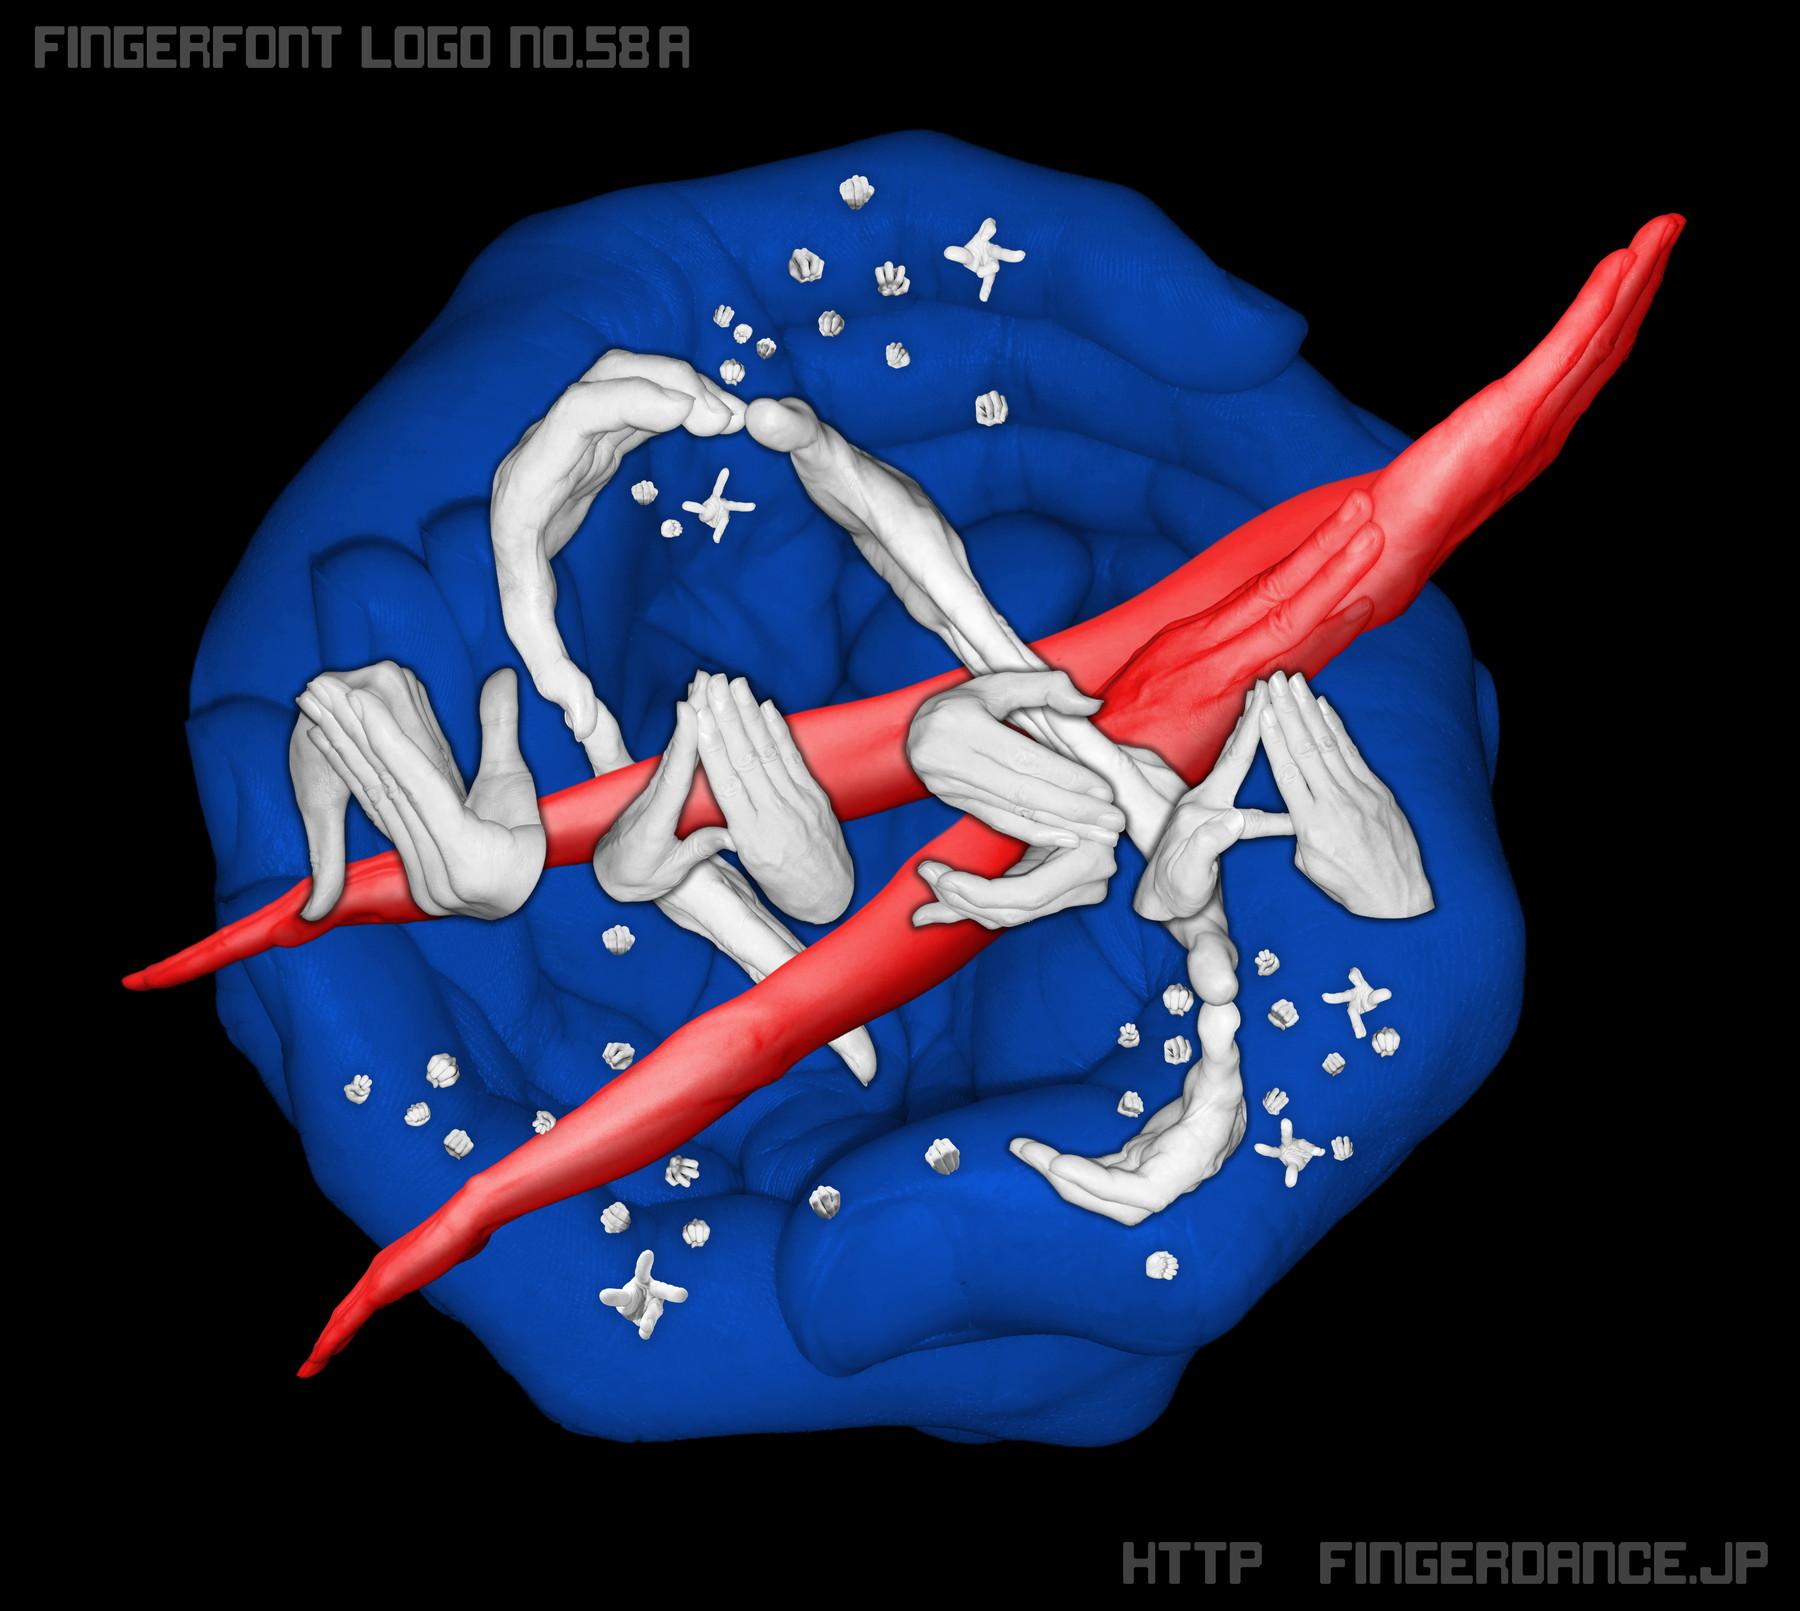 NASA-ナサフィンガーロゴハンド 手指